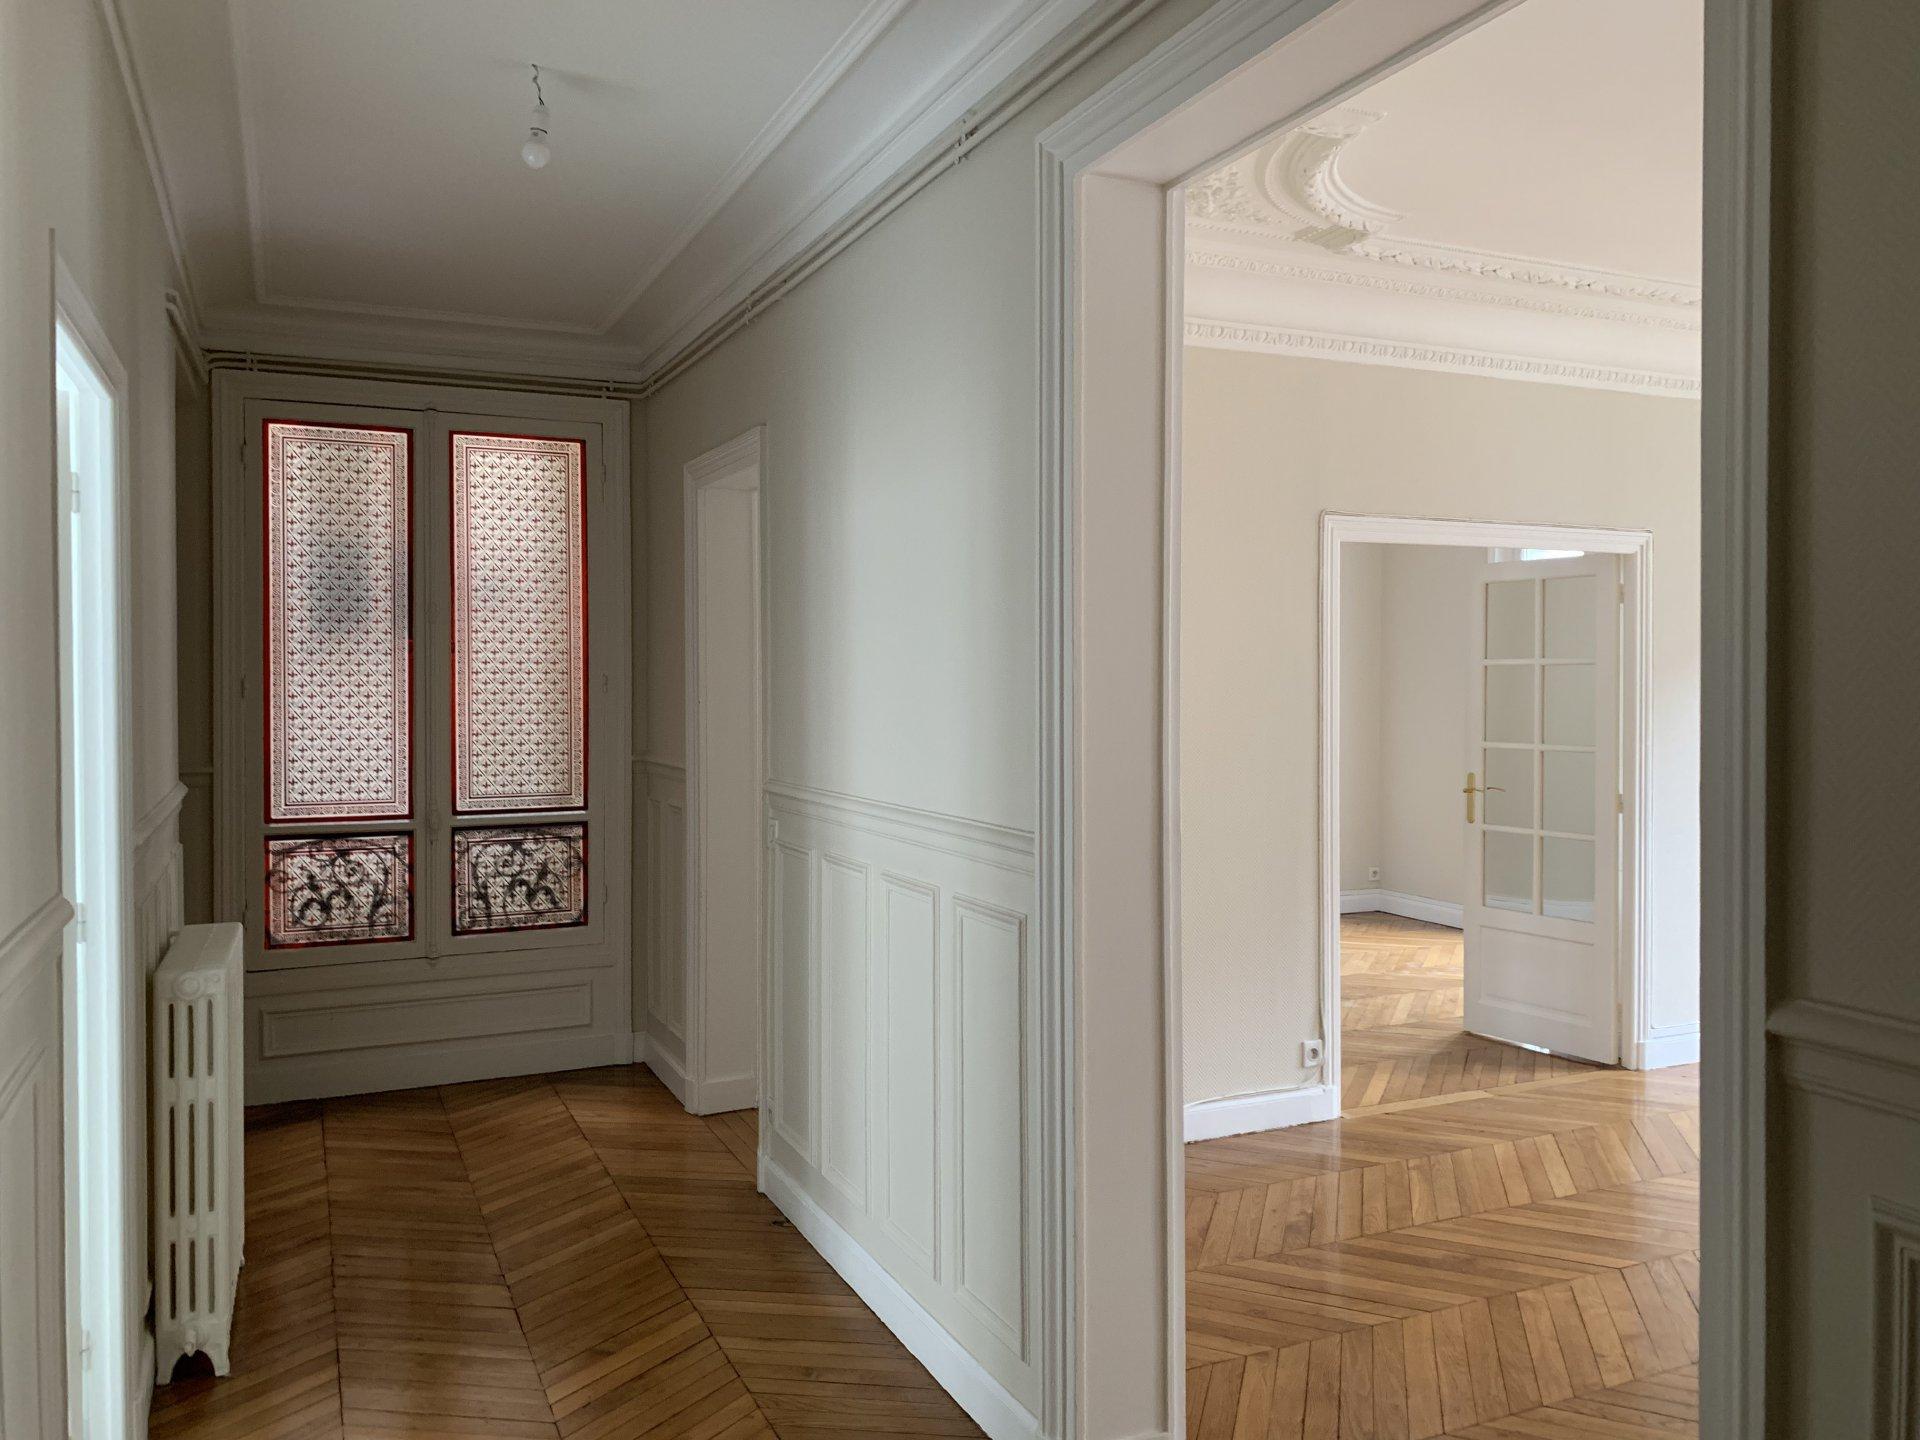 Paris IXe - Condorcet